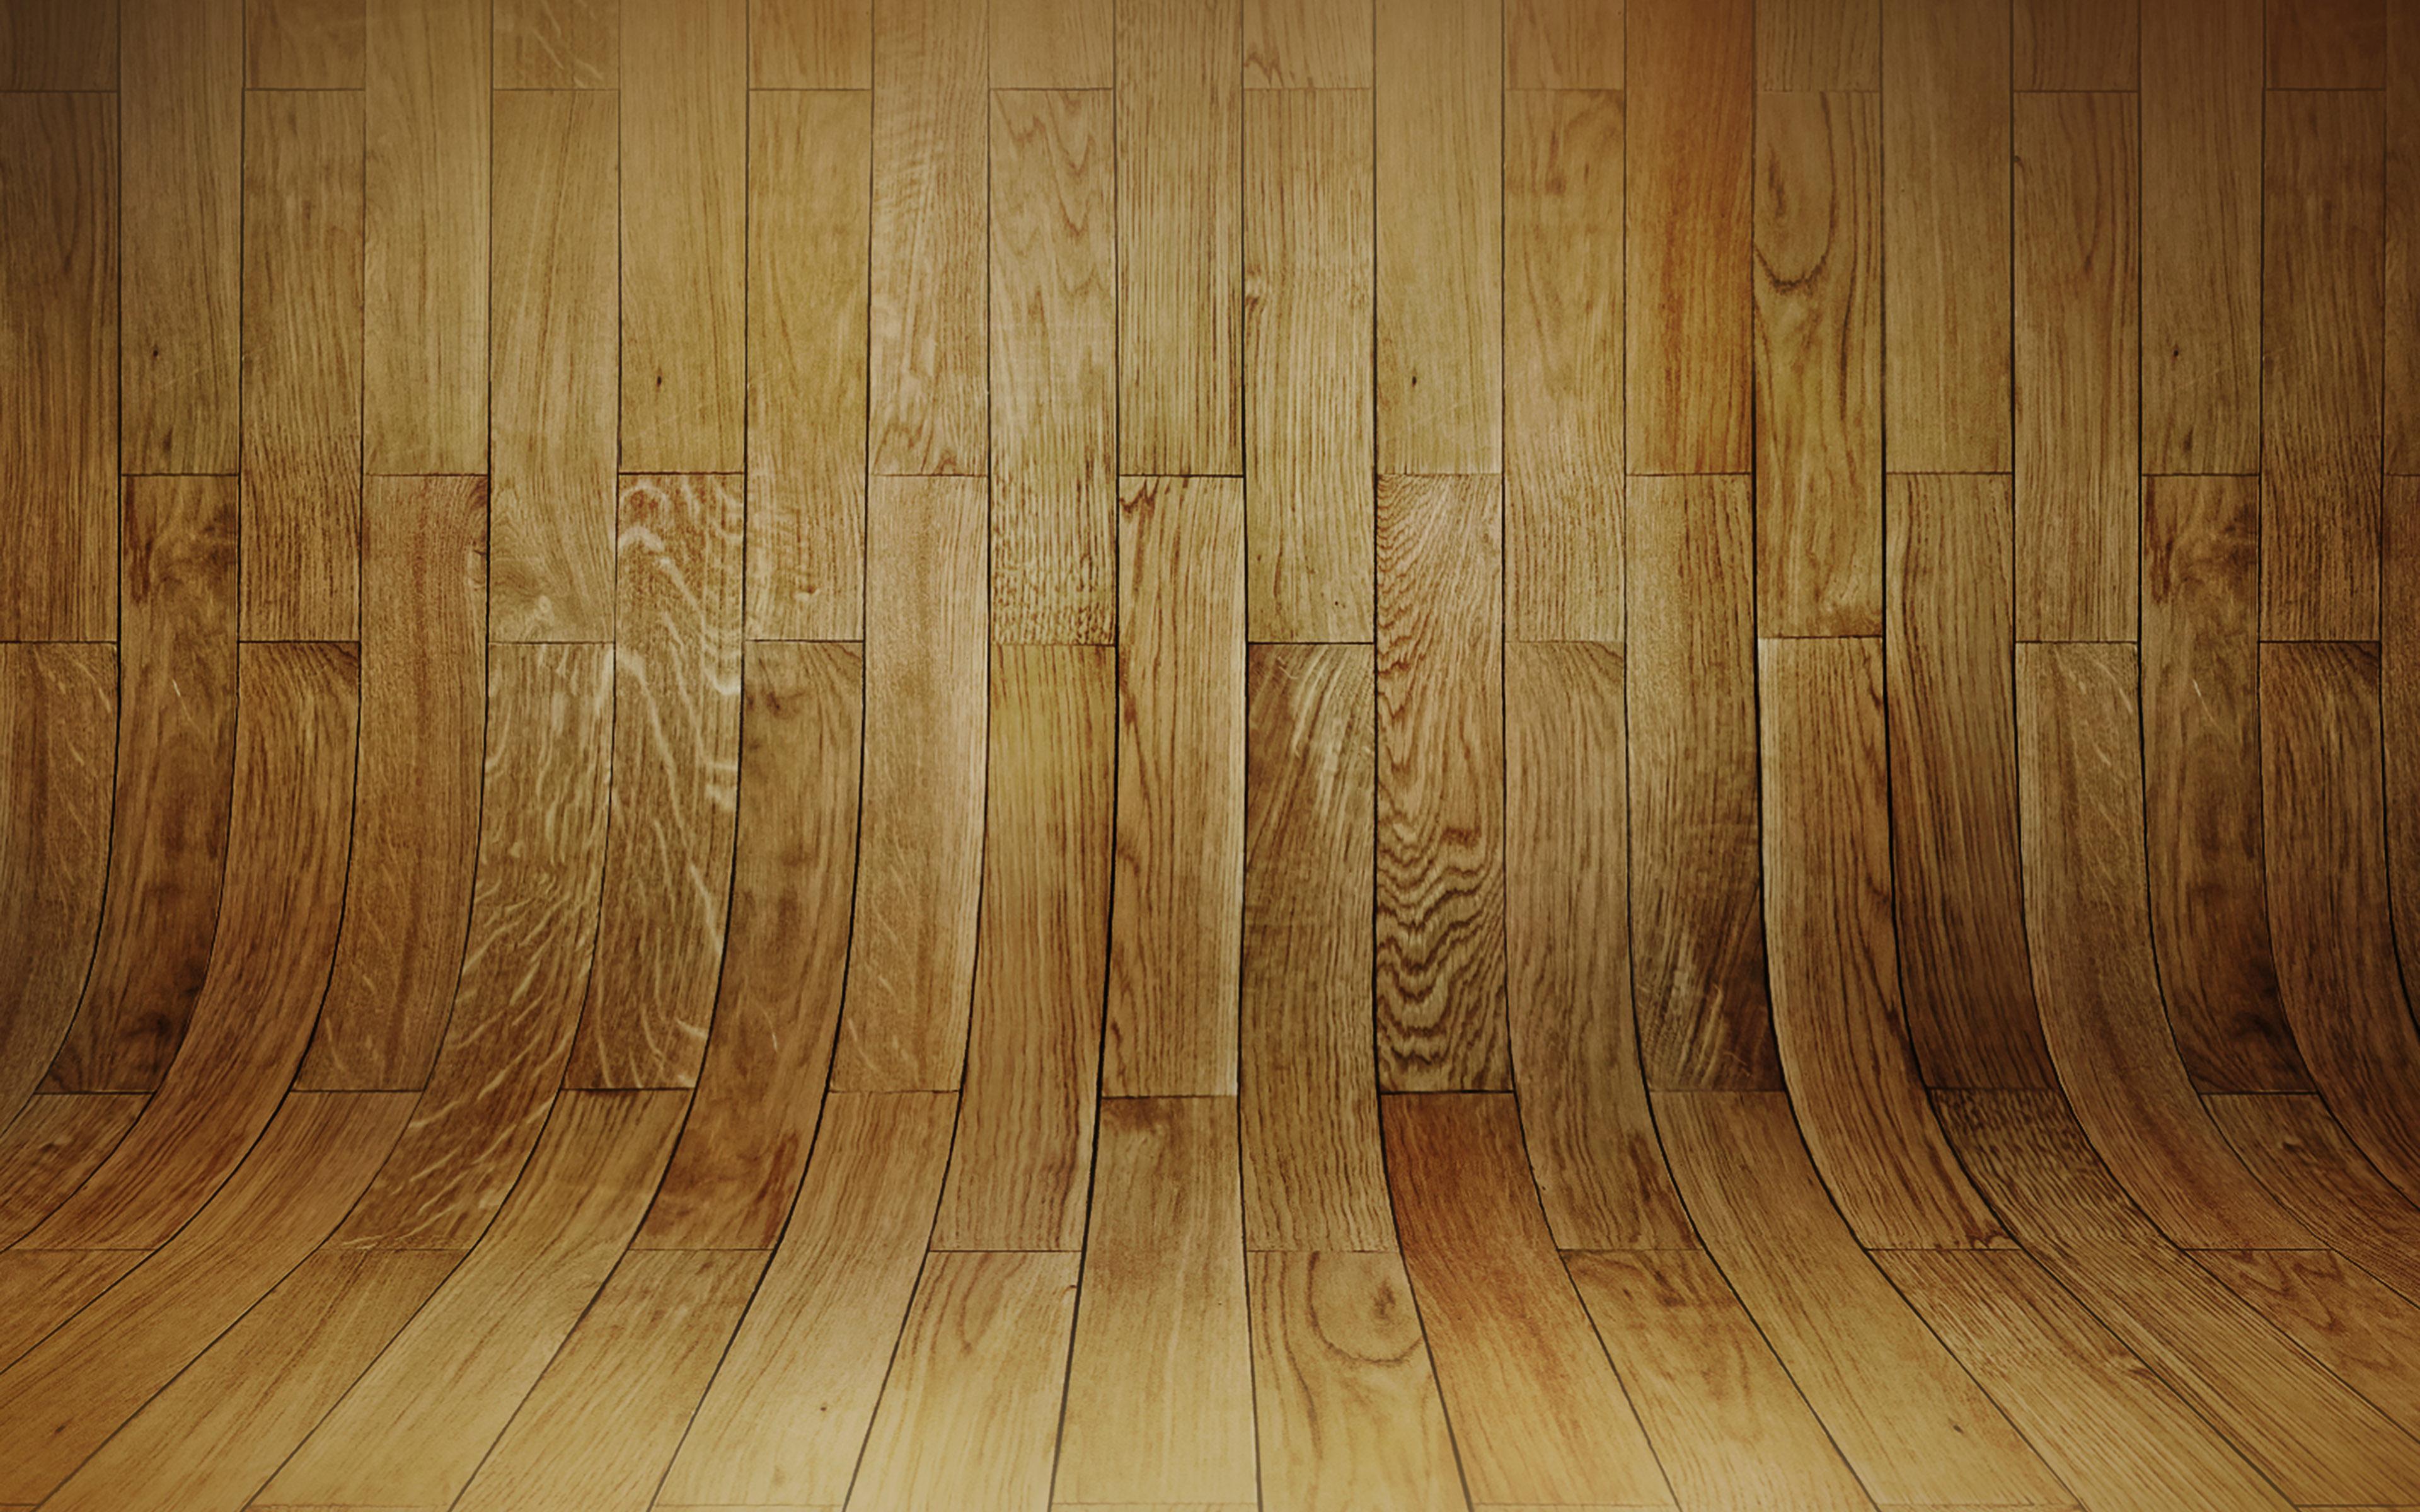 Wallpaper For Desktop Laptop Vf58 Wood Texture Nature Pattern